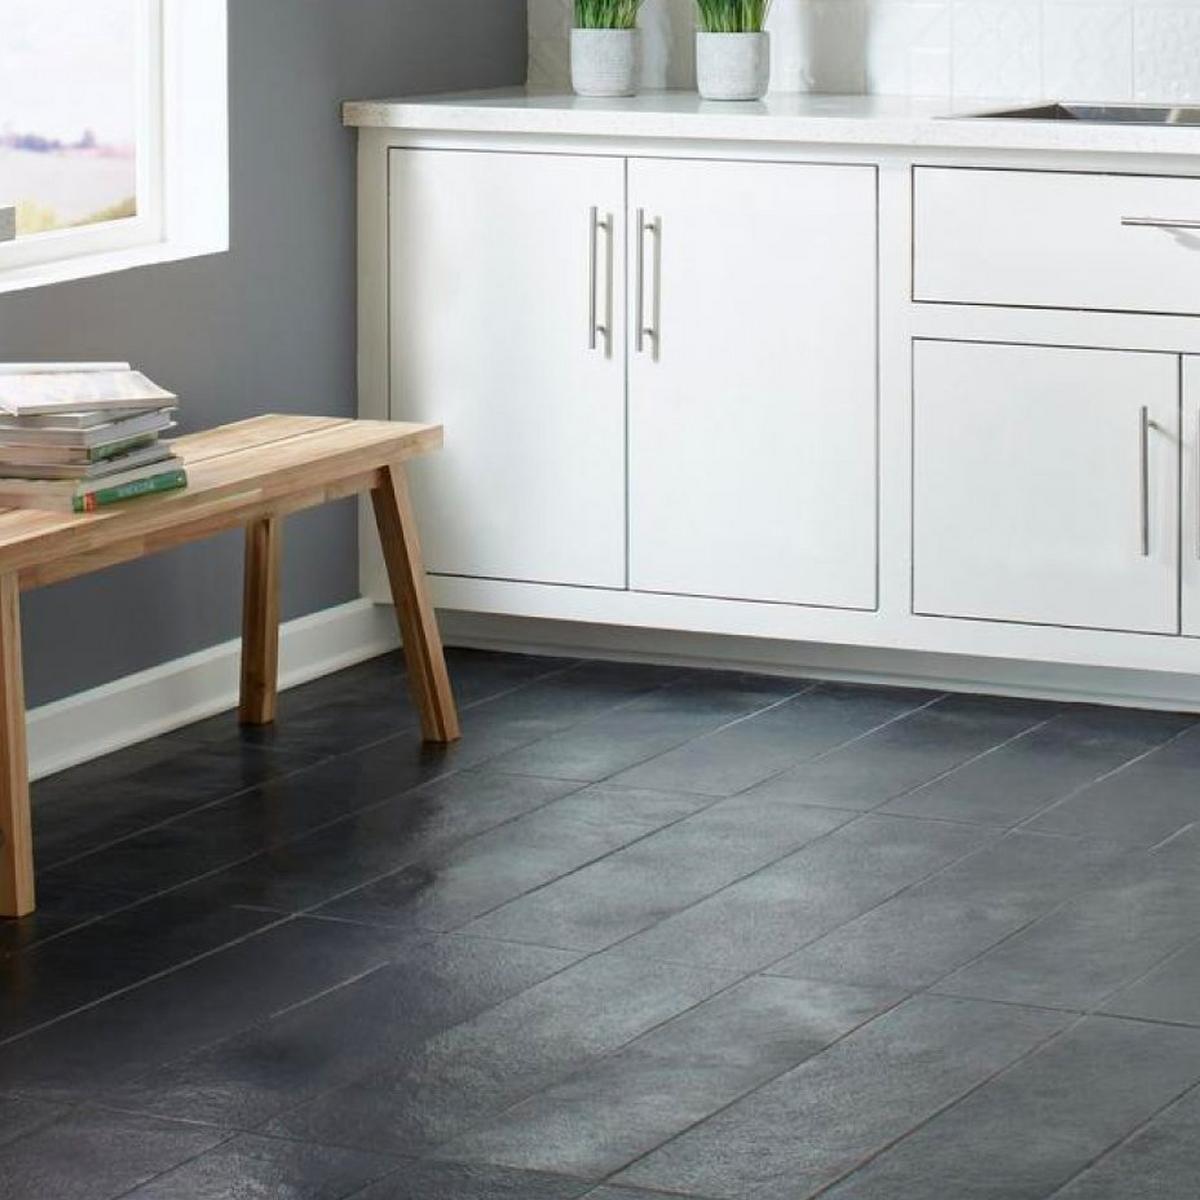 White Kitchen Cabinets Tile Floor: Floor & Decor